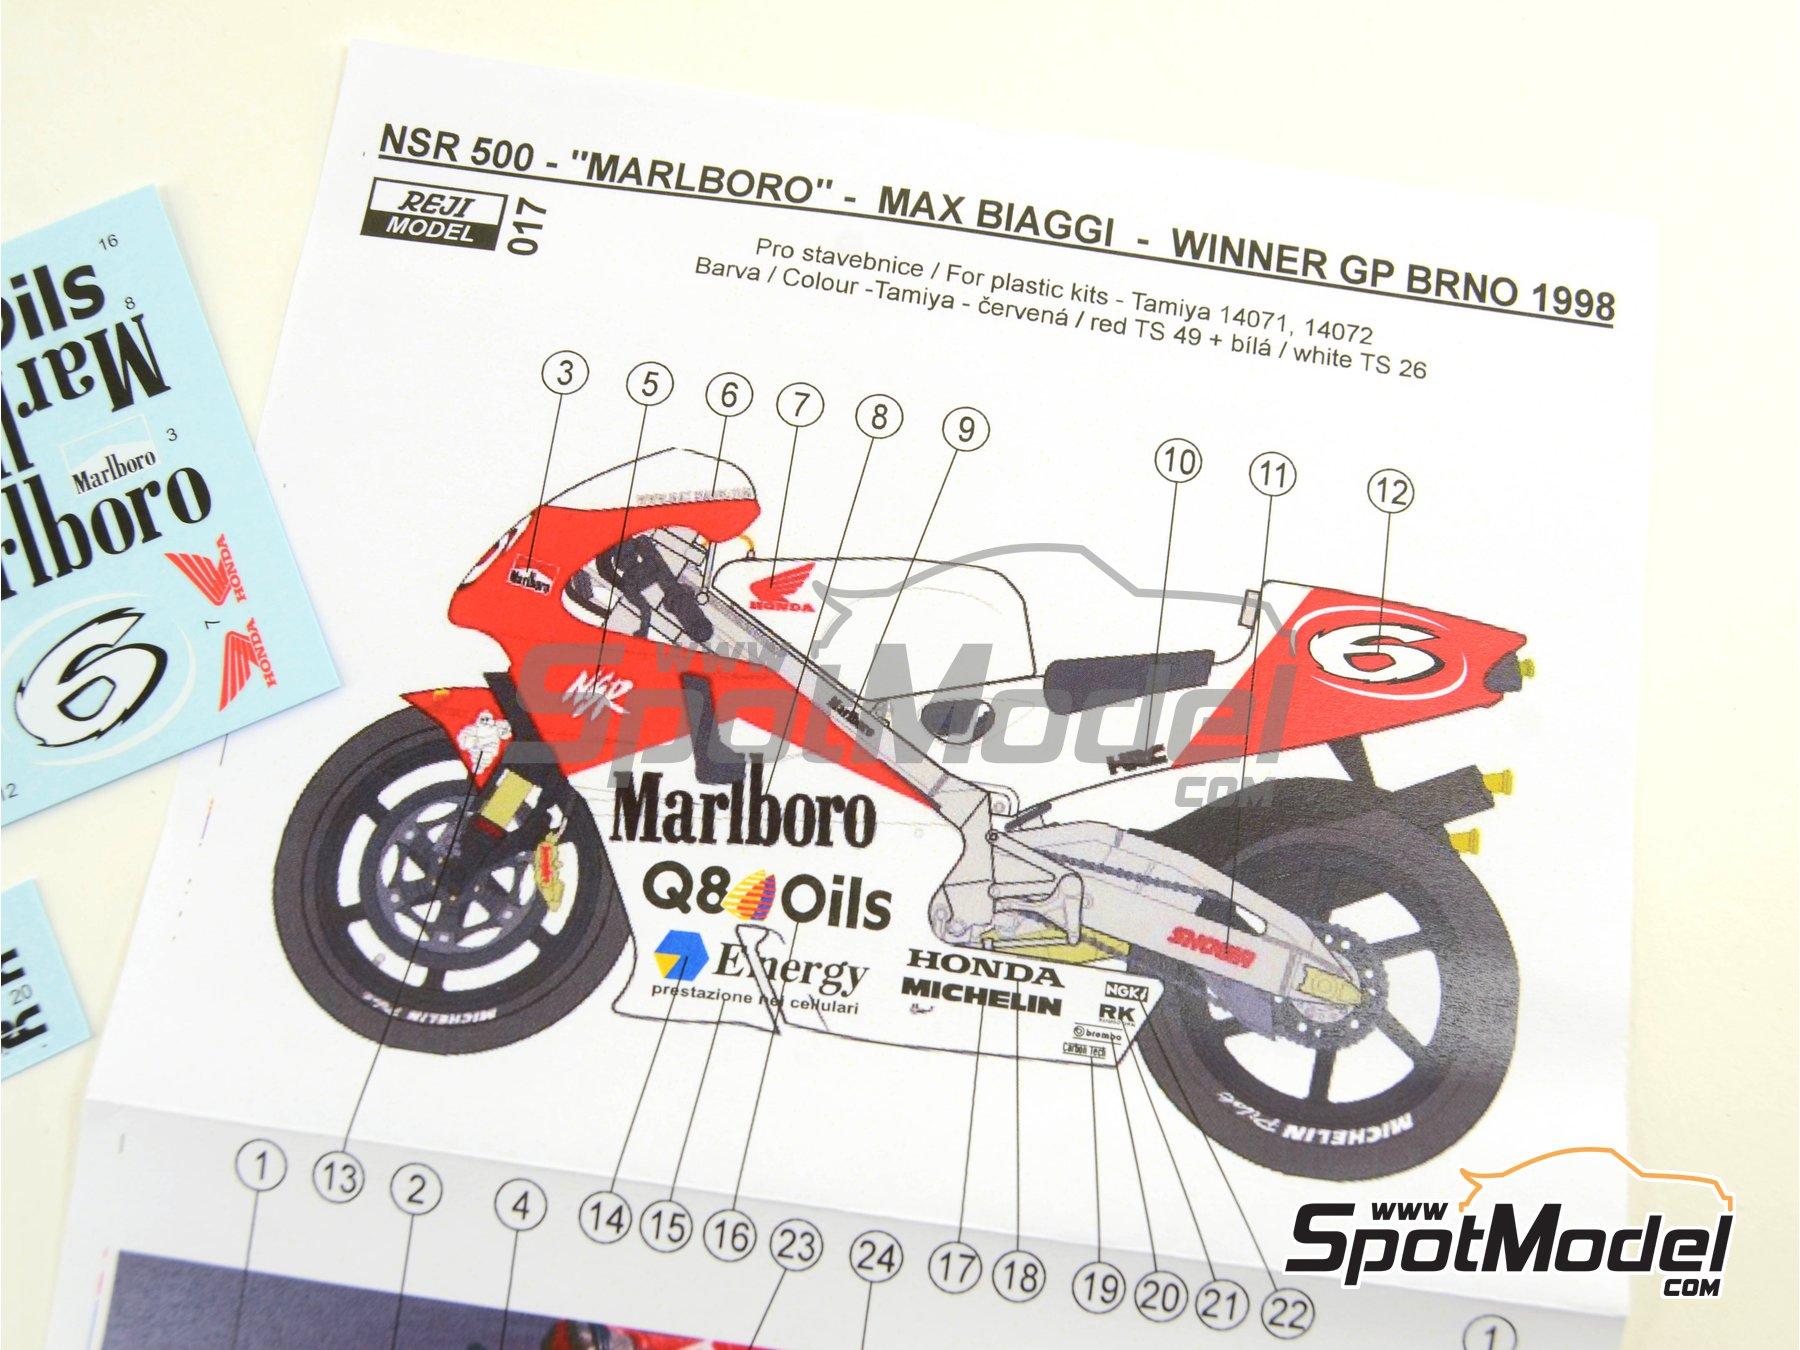 Image 5: Honda NSR500 Marlboro - Brno Formula 1 Grand Prix, Brno Moto GP Grand Prix 1998 | Marking / livery in 1/12 scale manufactured by Reji Model (ref.REJI-017)